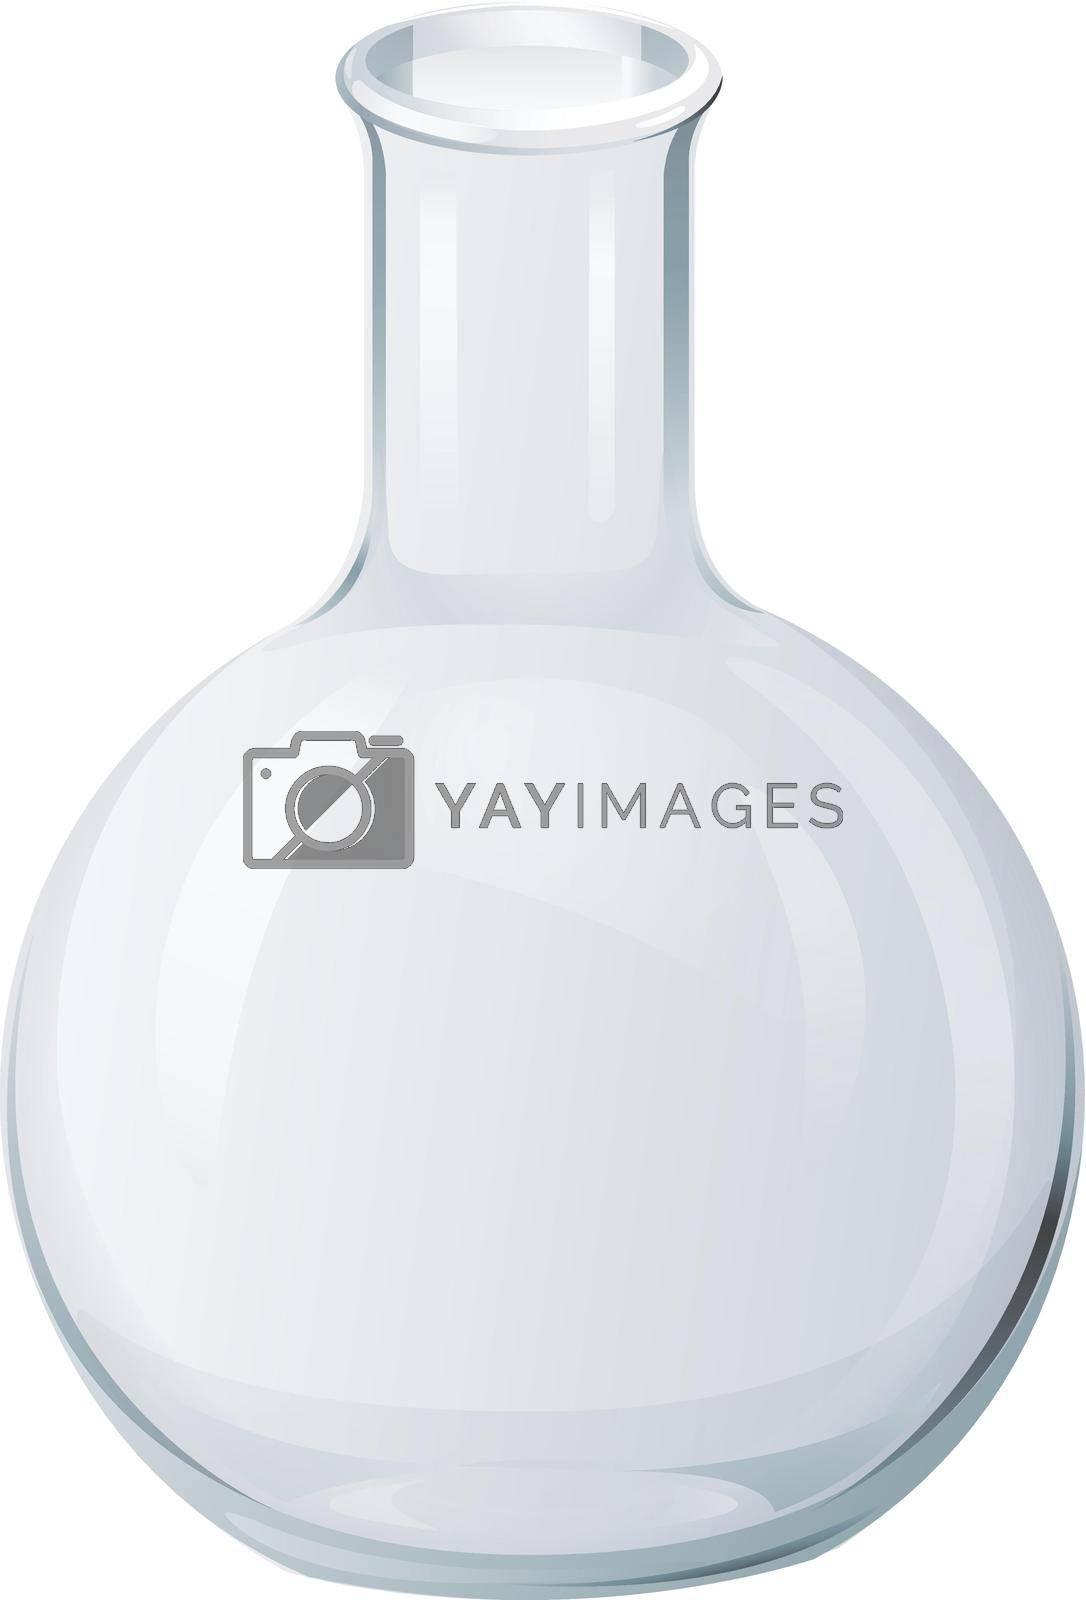 Illustration of scientific glassware - flasks